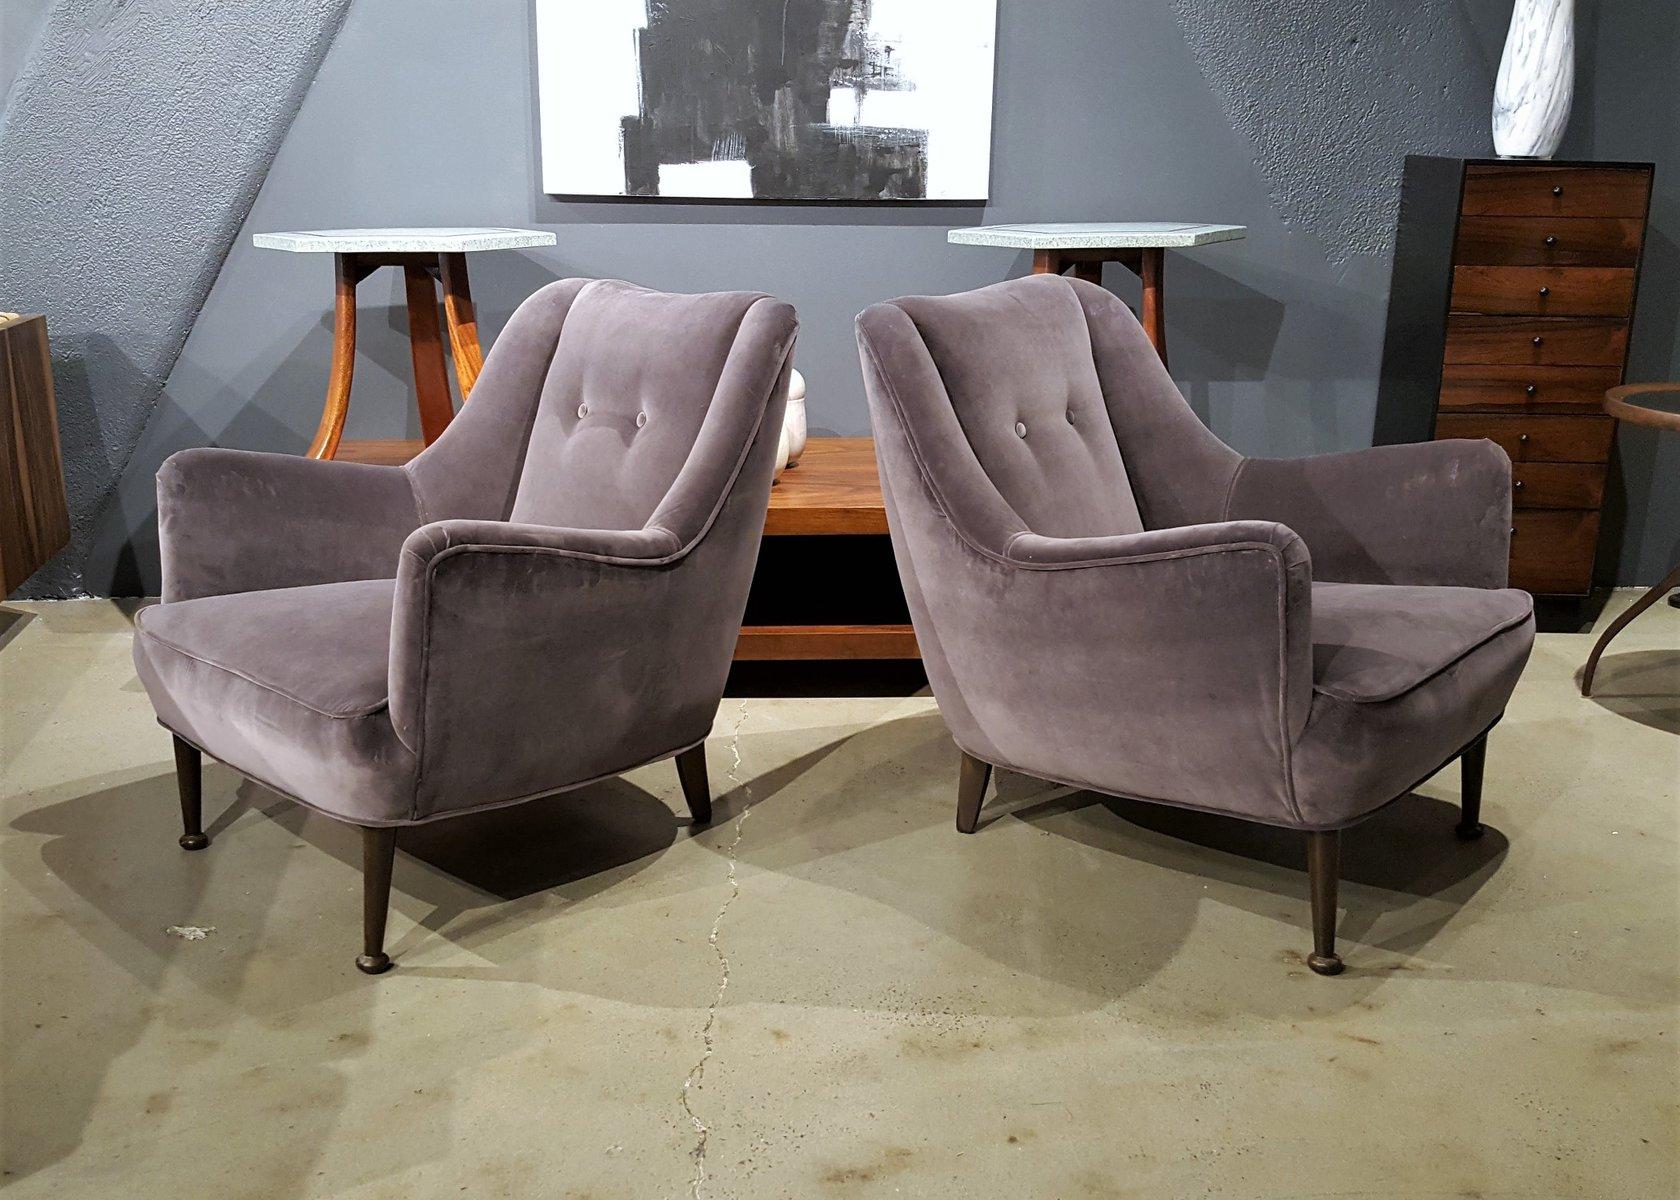 Mid-Century Modern Sessel in Dunklem Lila-Grauem Samt, 2er Set